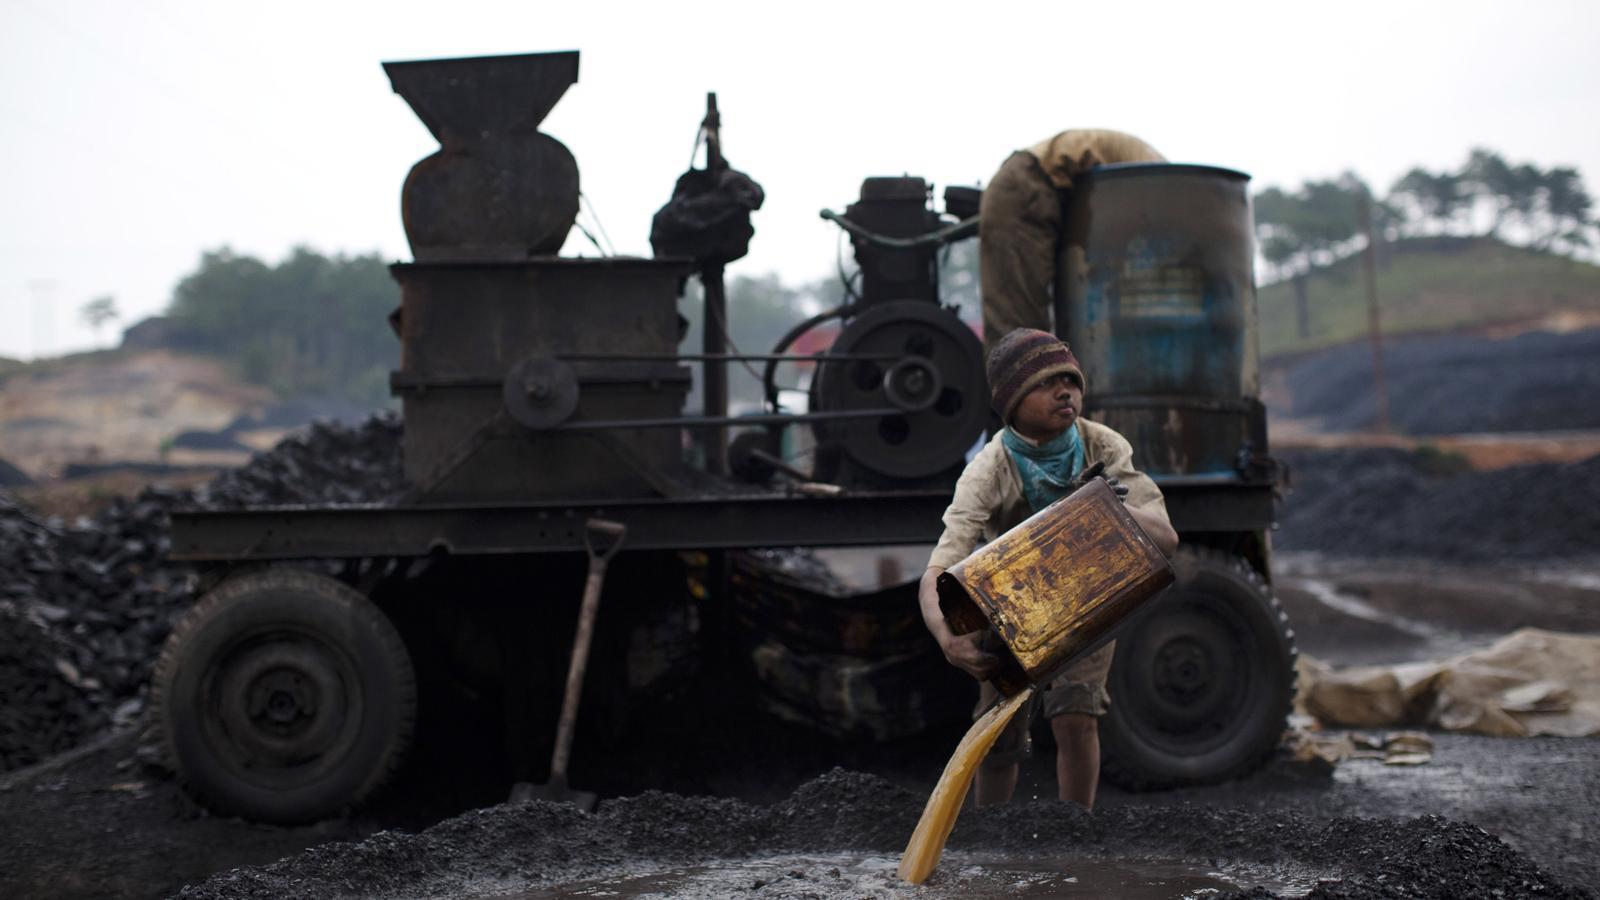 Nen treballant a la Índia